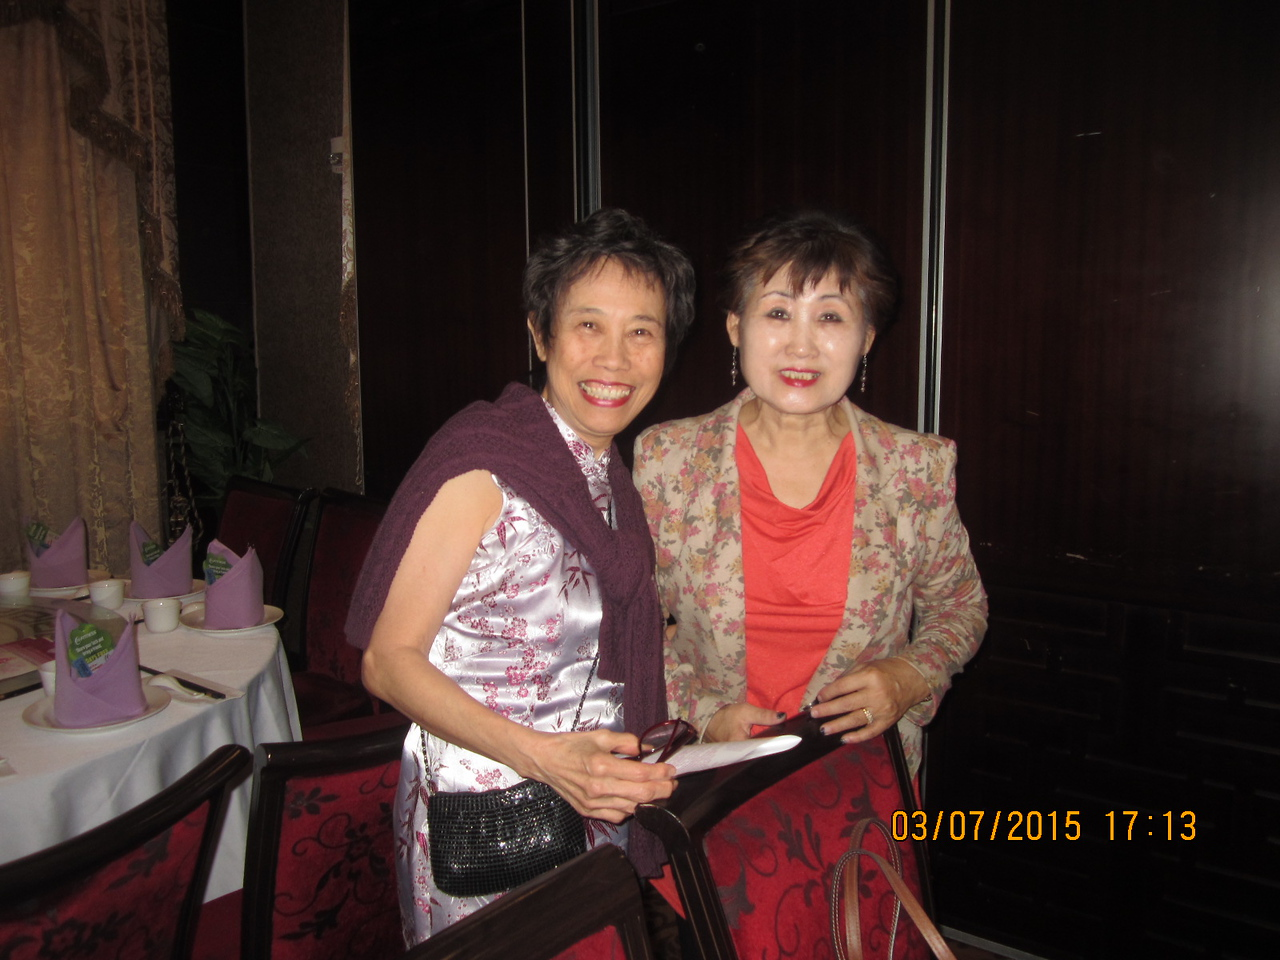 Choo with Jann